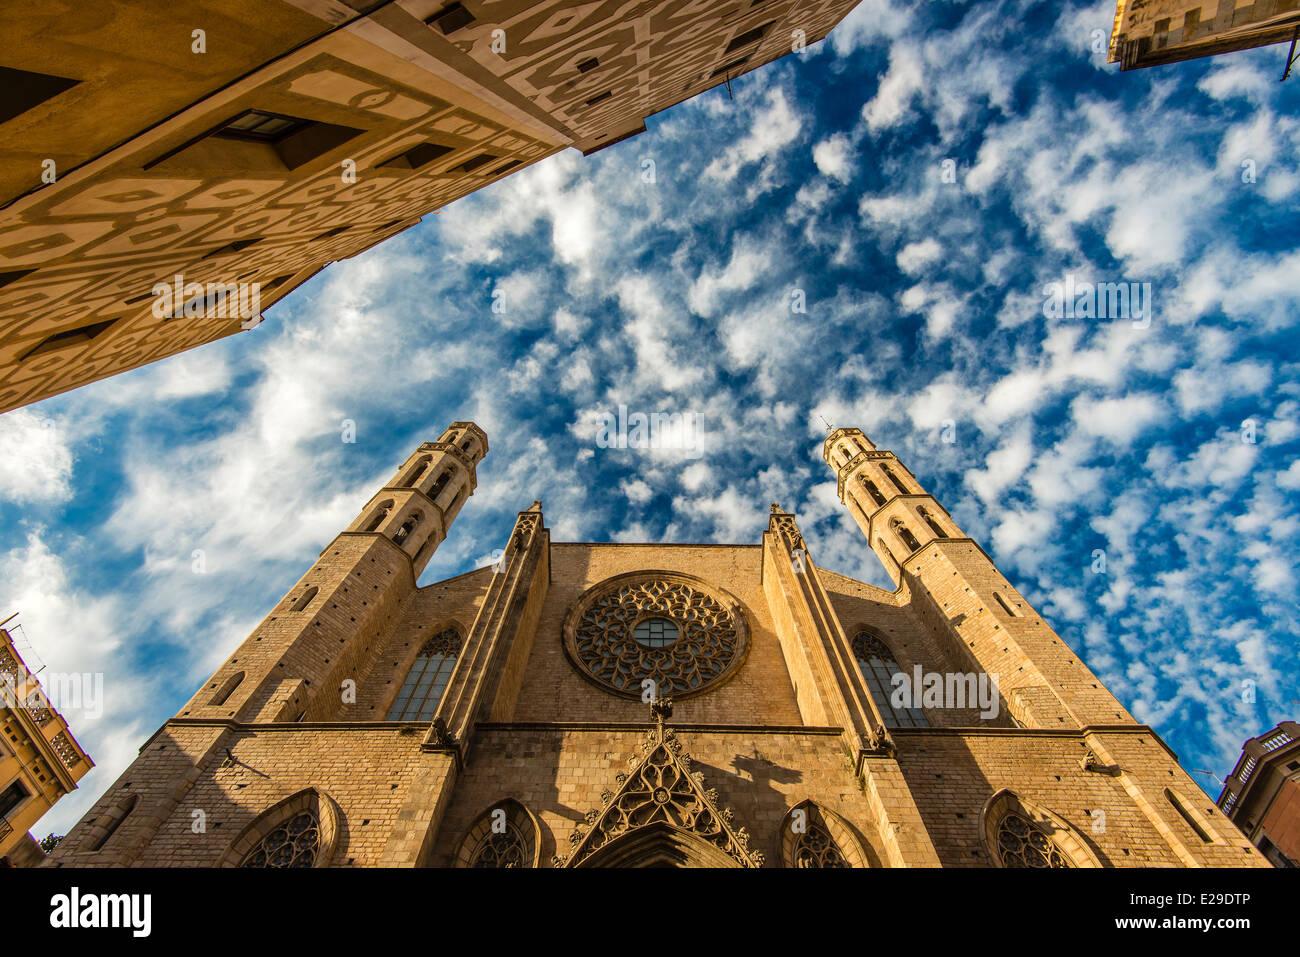 Facade of Santa Maria del Mar church, Born district, Barcelona, Catalonia, Spain - Stock Image